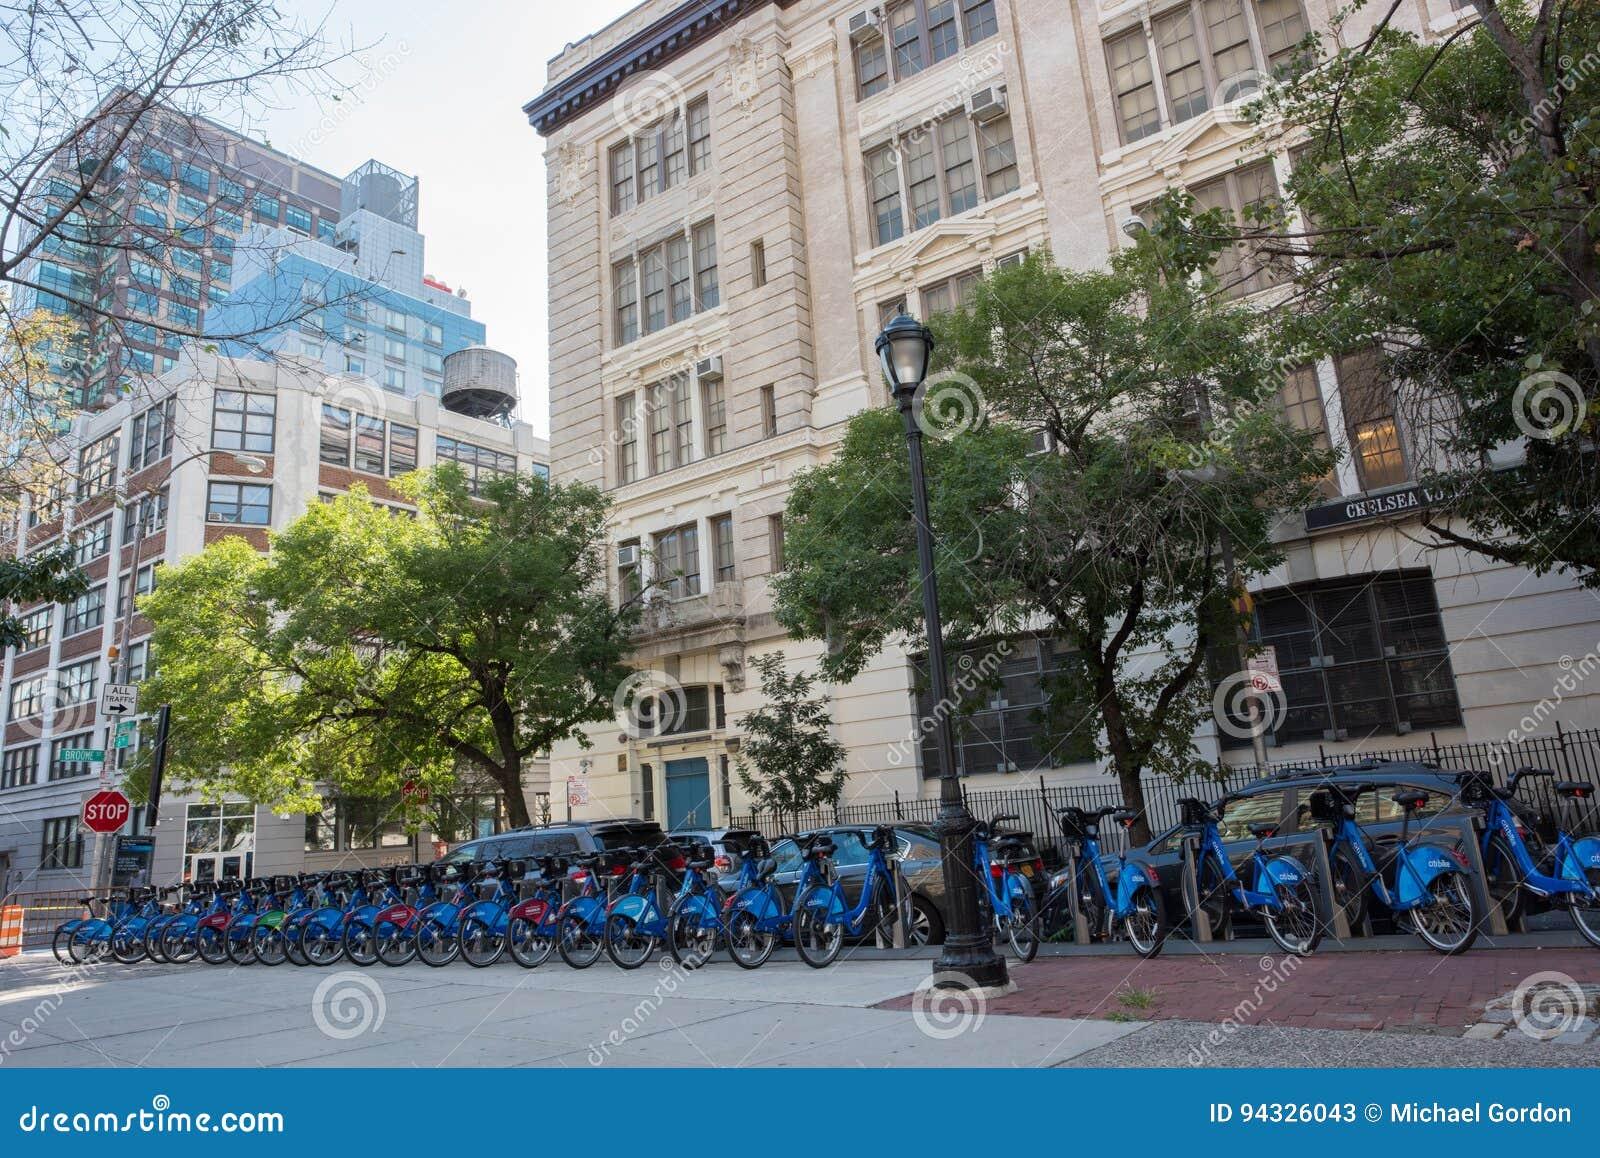 Bike sharing program in NYC